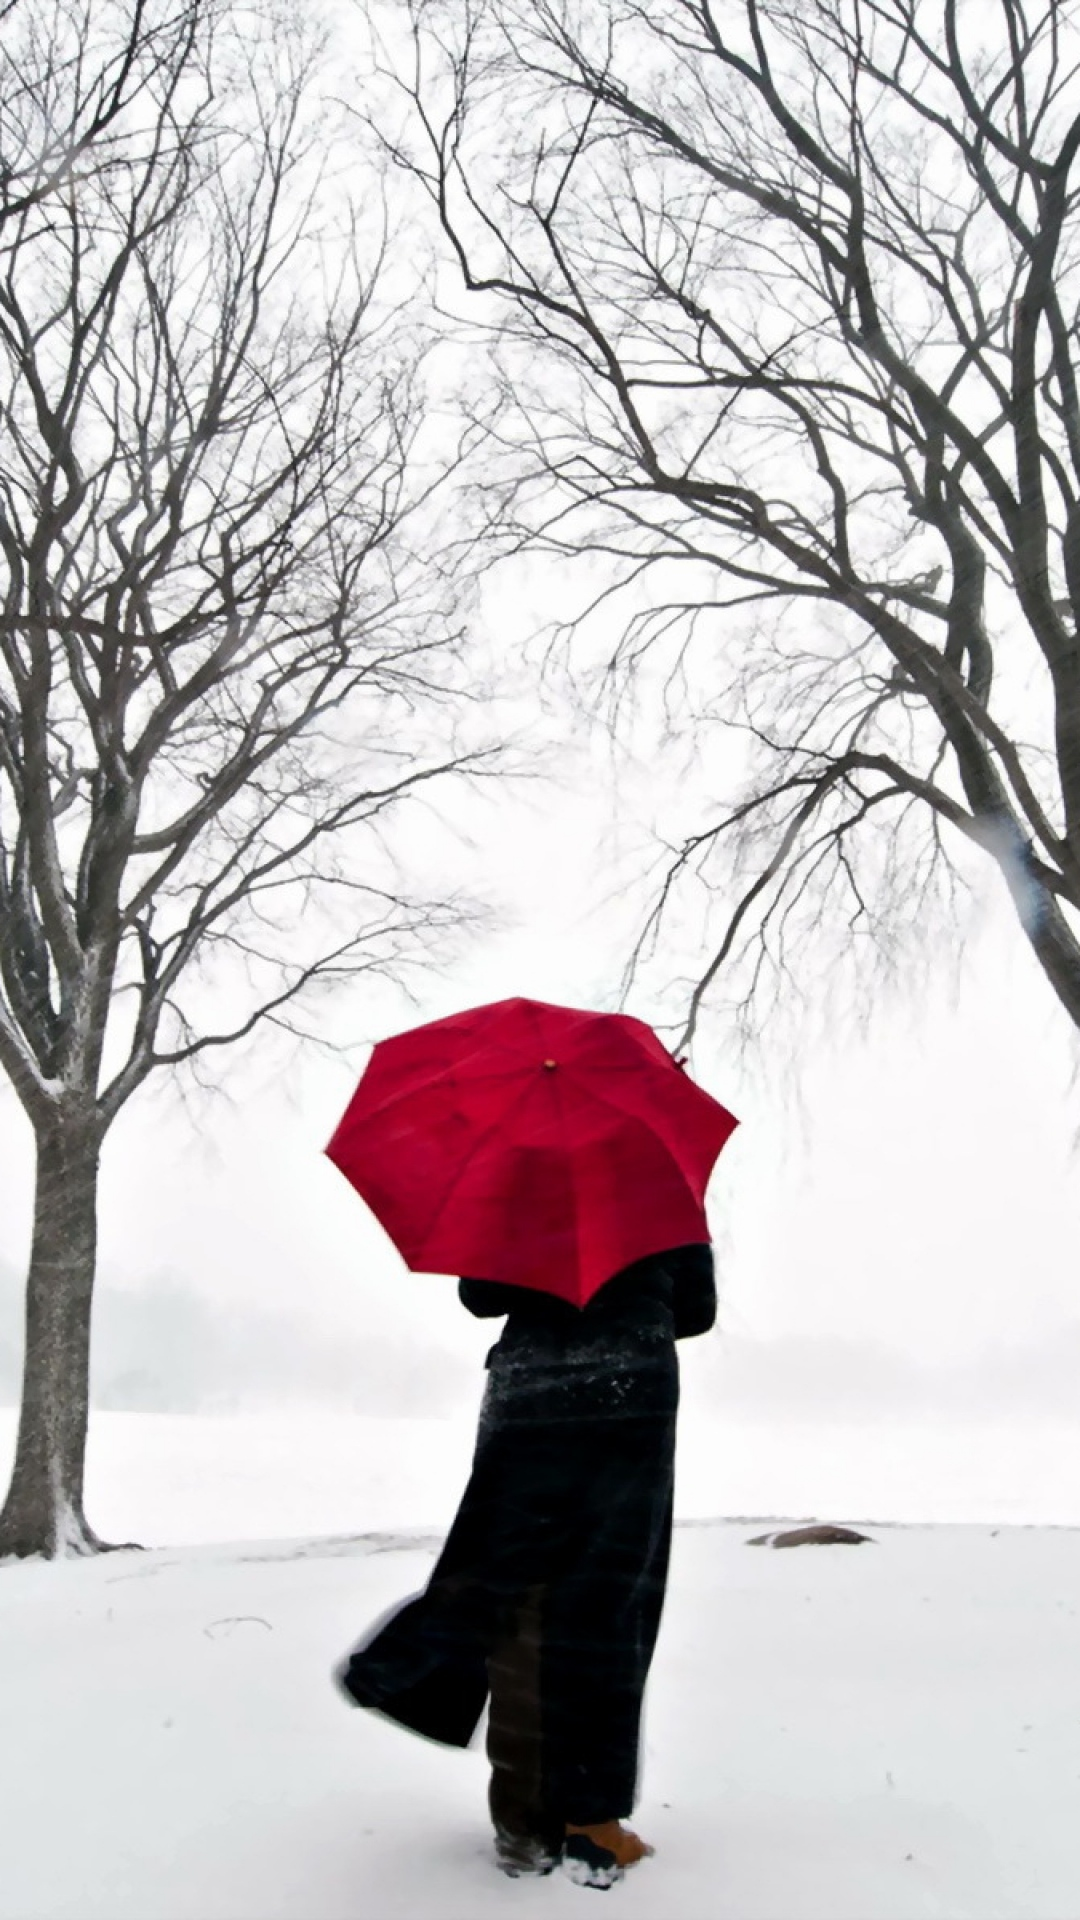 girl_umbrella_cherry_snow_japan_31460_1080x1920